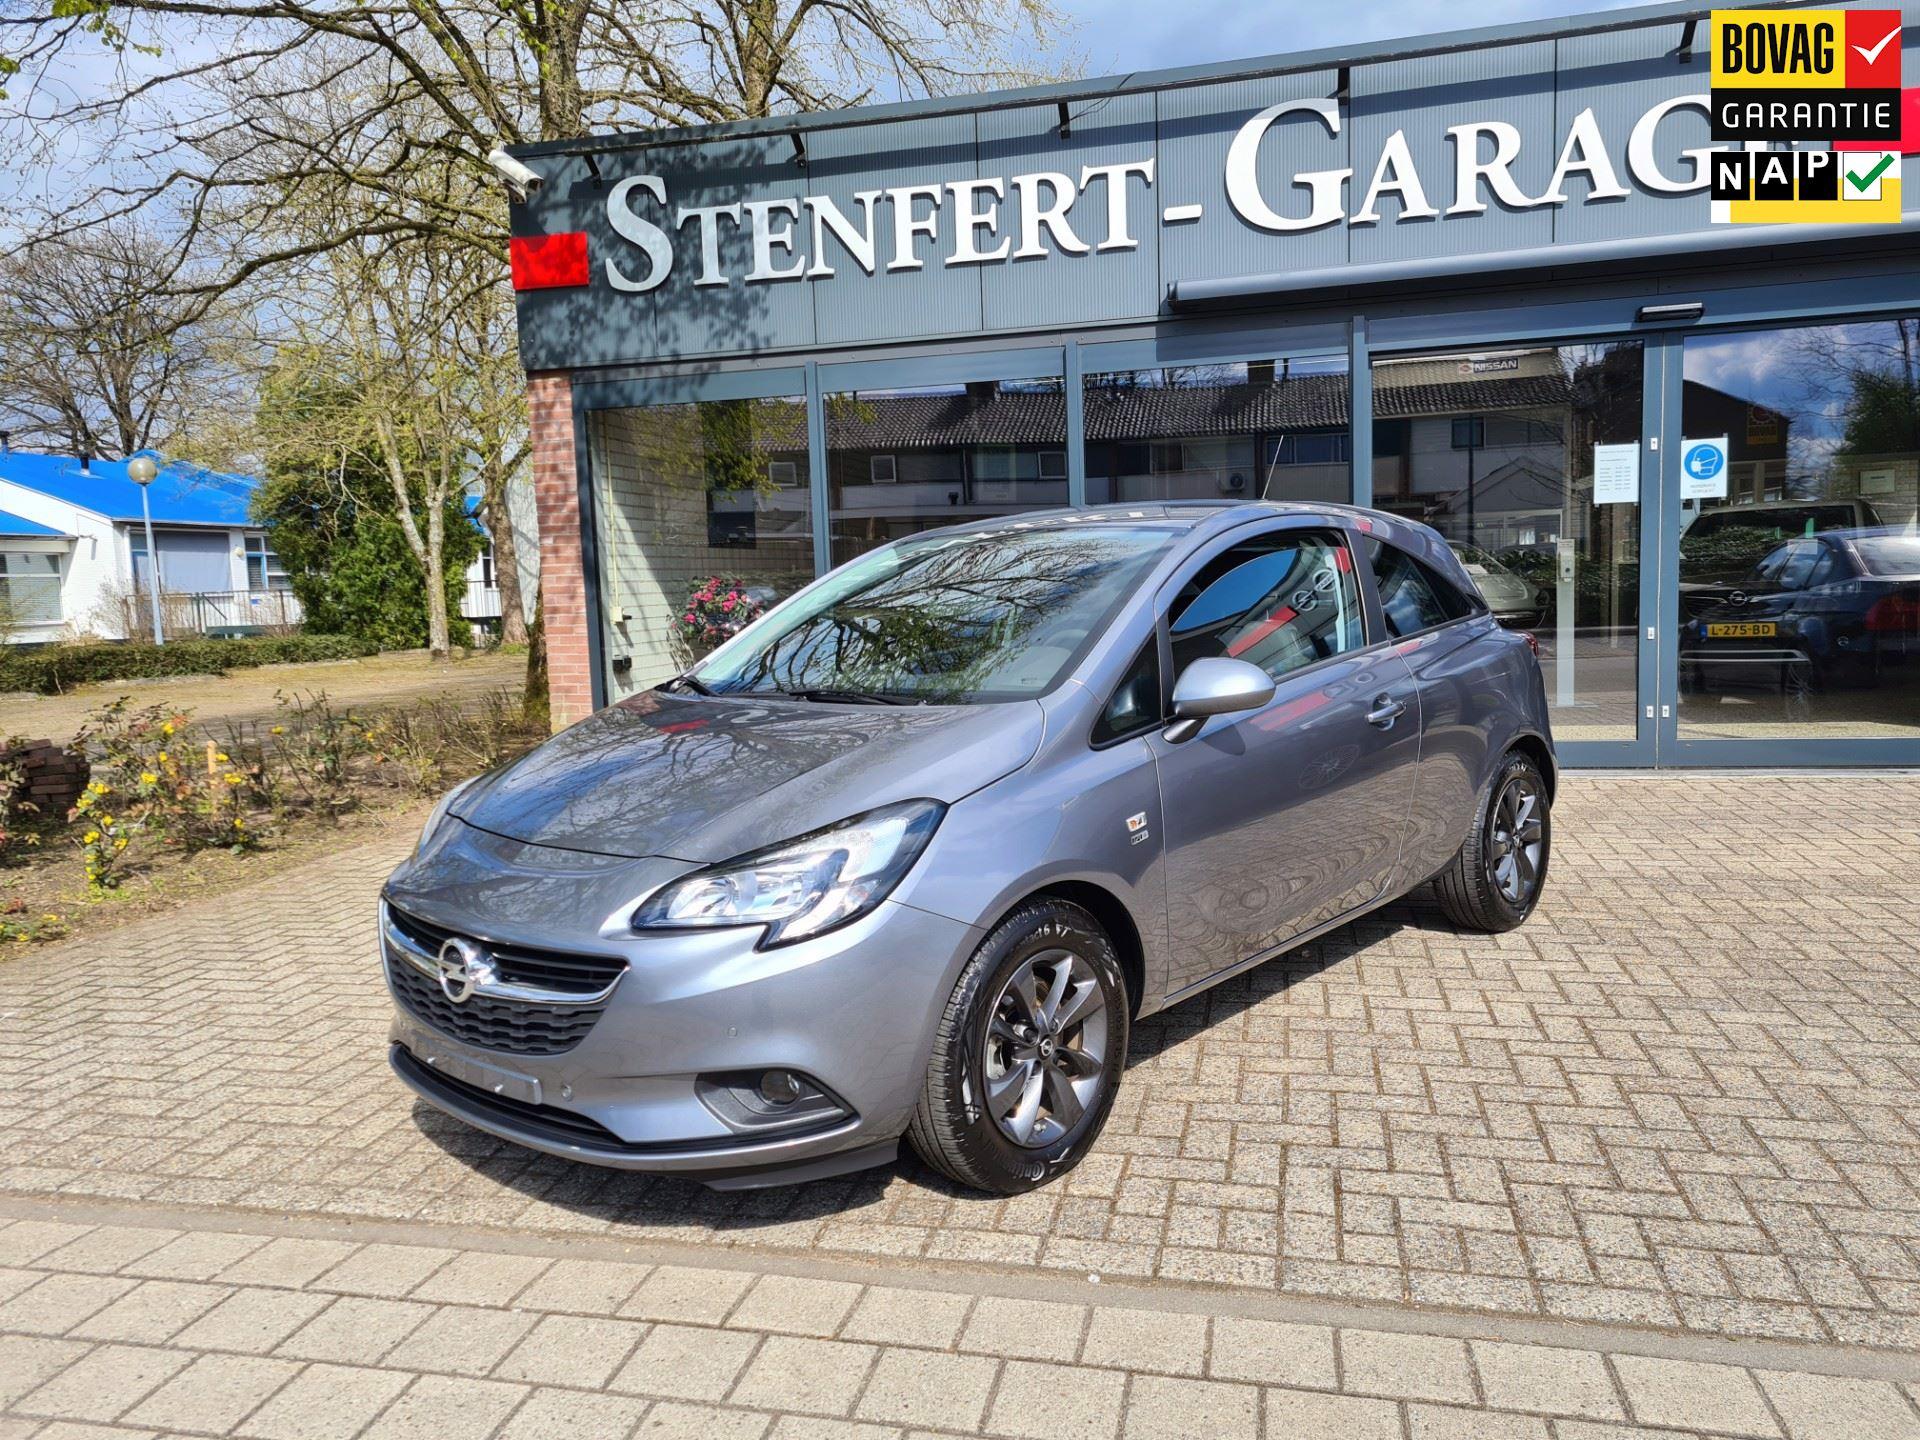 Opel Corsa 1.4 Turbo 3drs 150 pk occasion - Stenfert-Garage